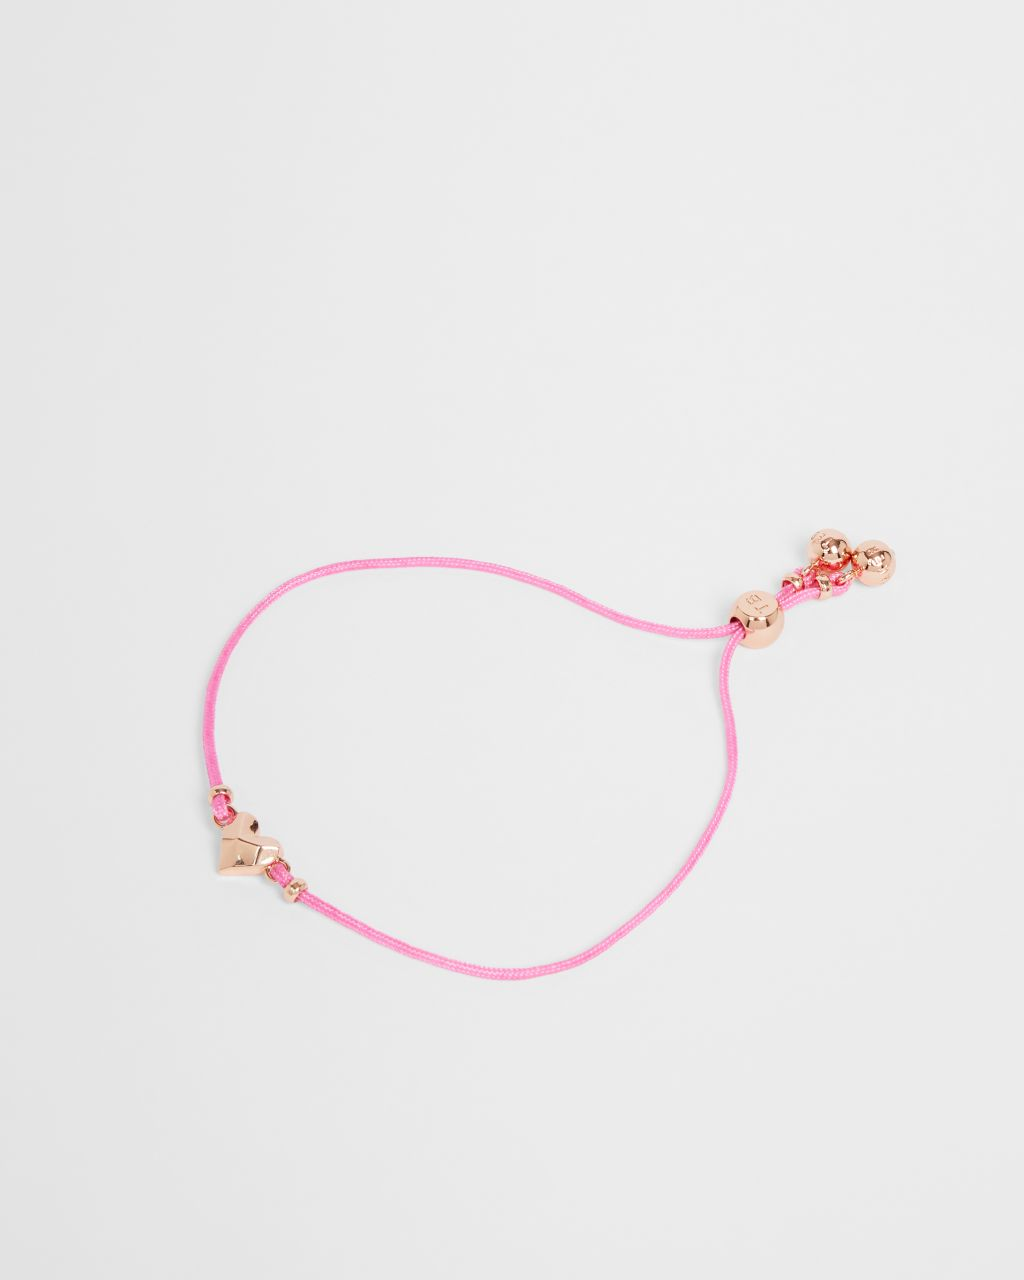 Tbj2651 Faceted Heart Cord Bracelet